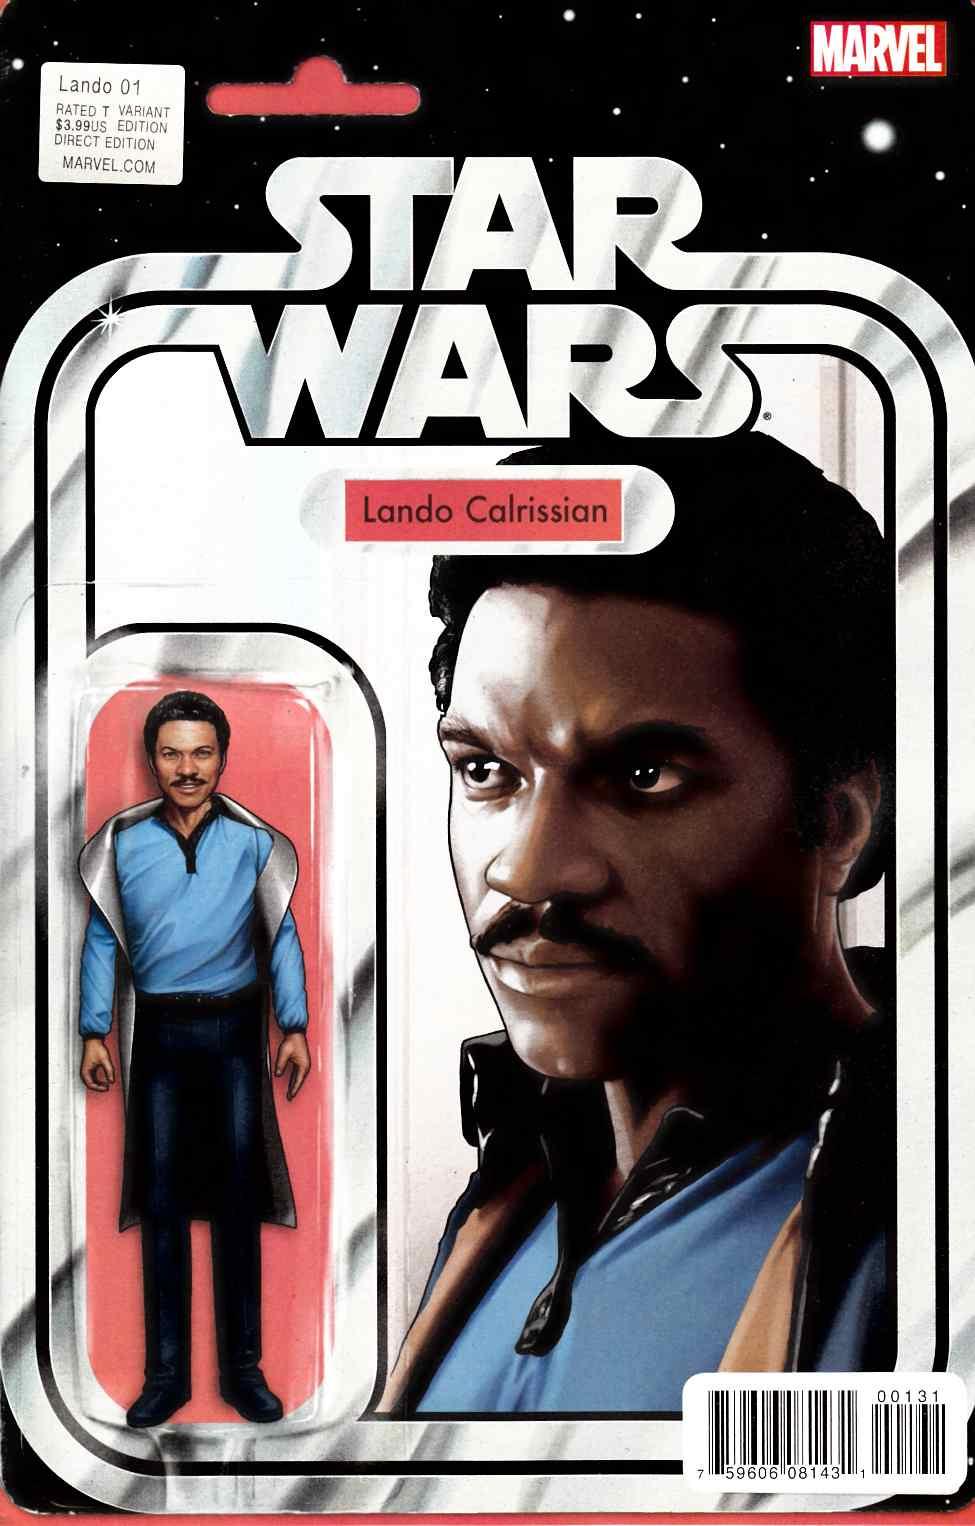 Star Wars Lando #1 2015 Blank Variant Cover Marvel Comics